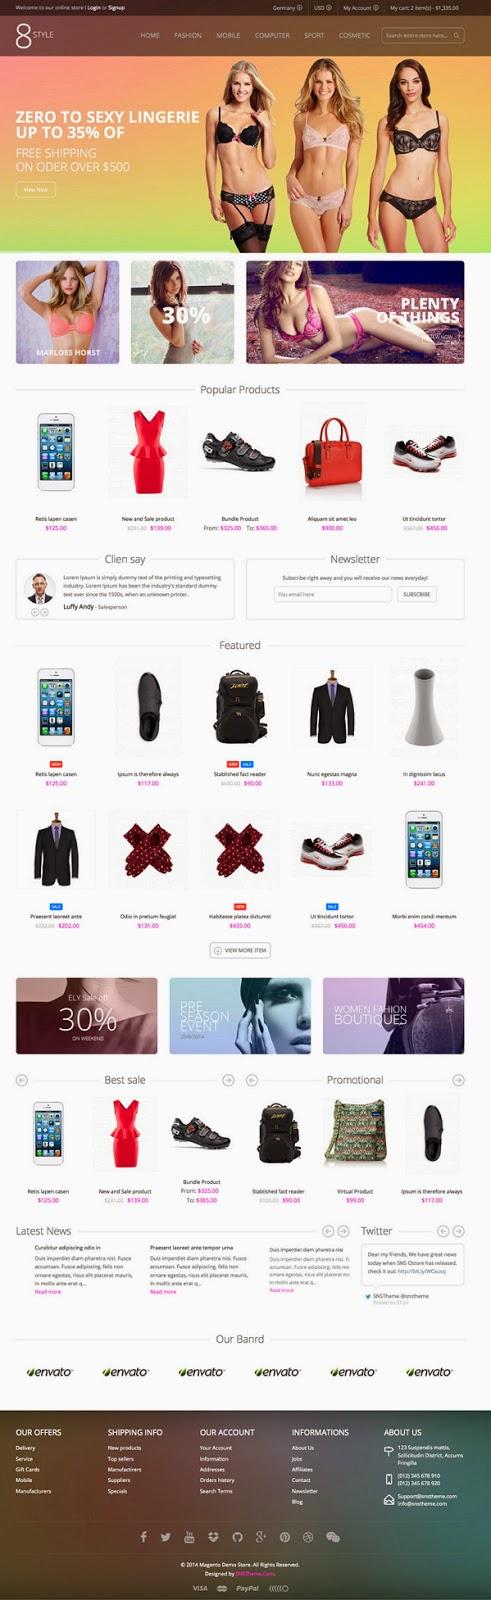 online_store_website_template